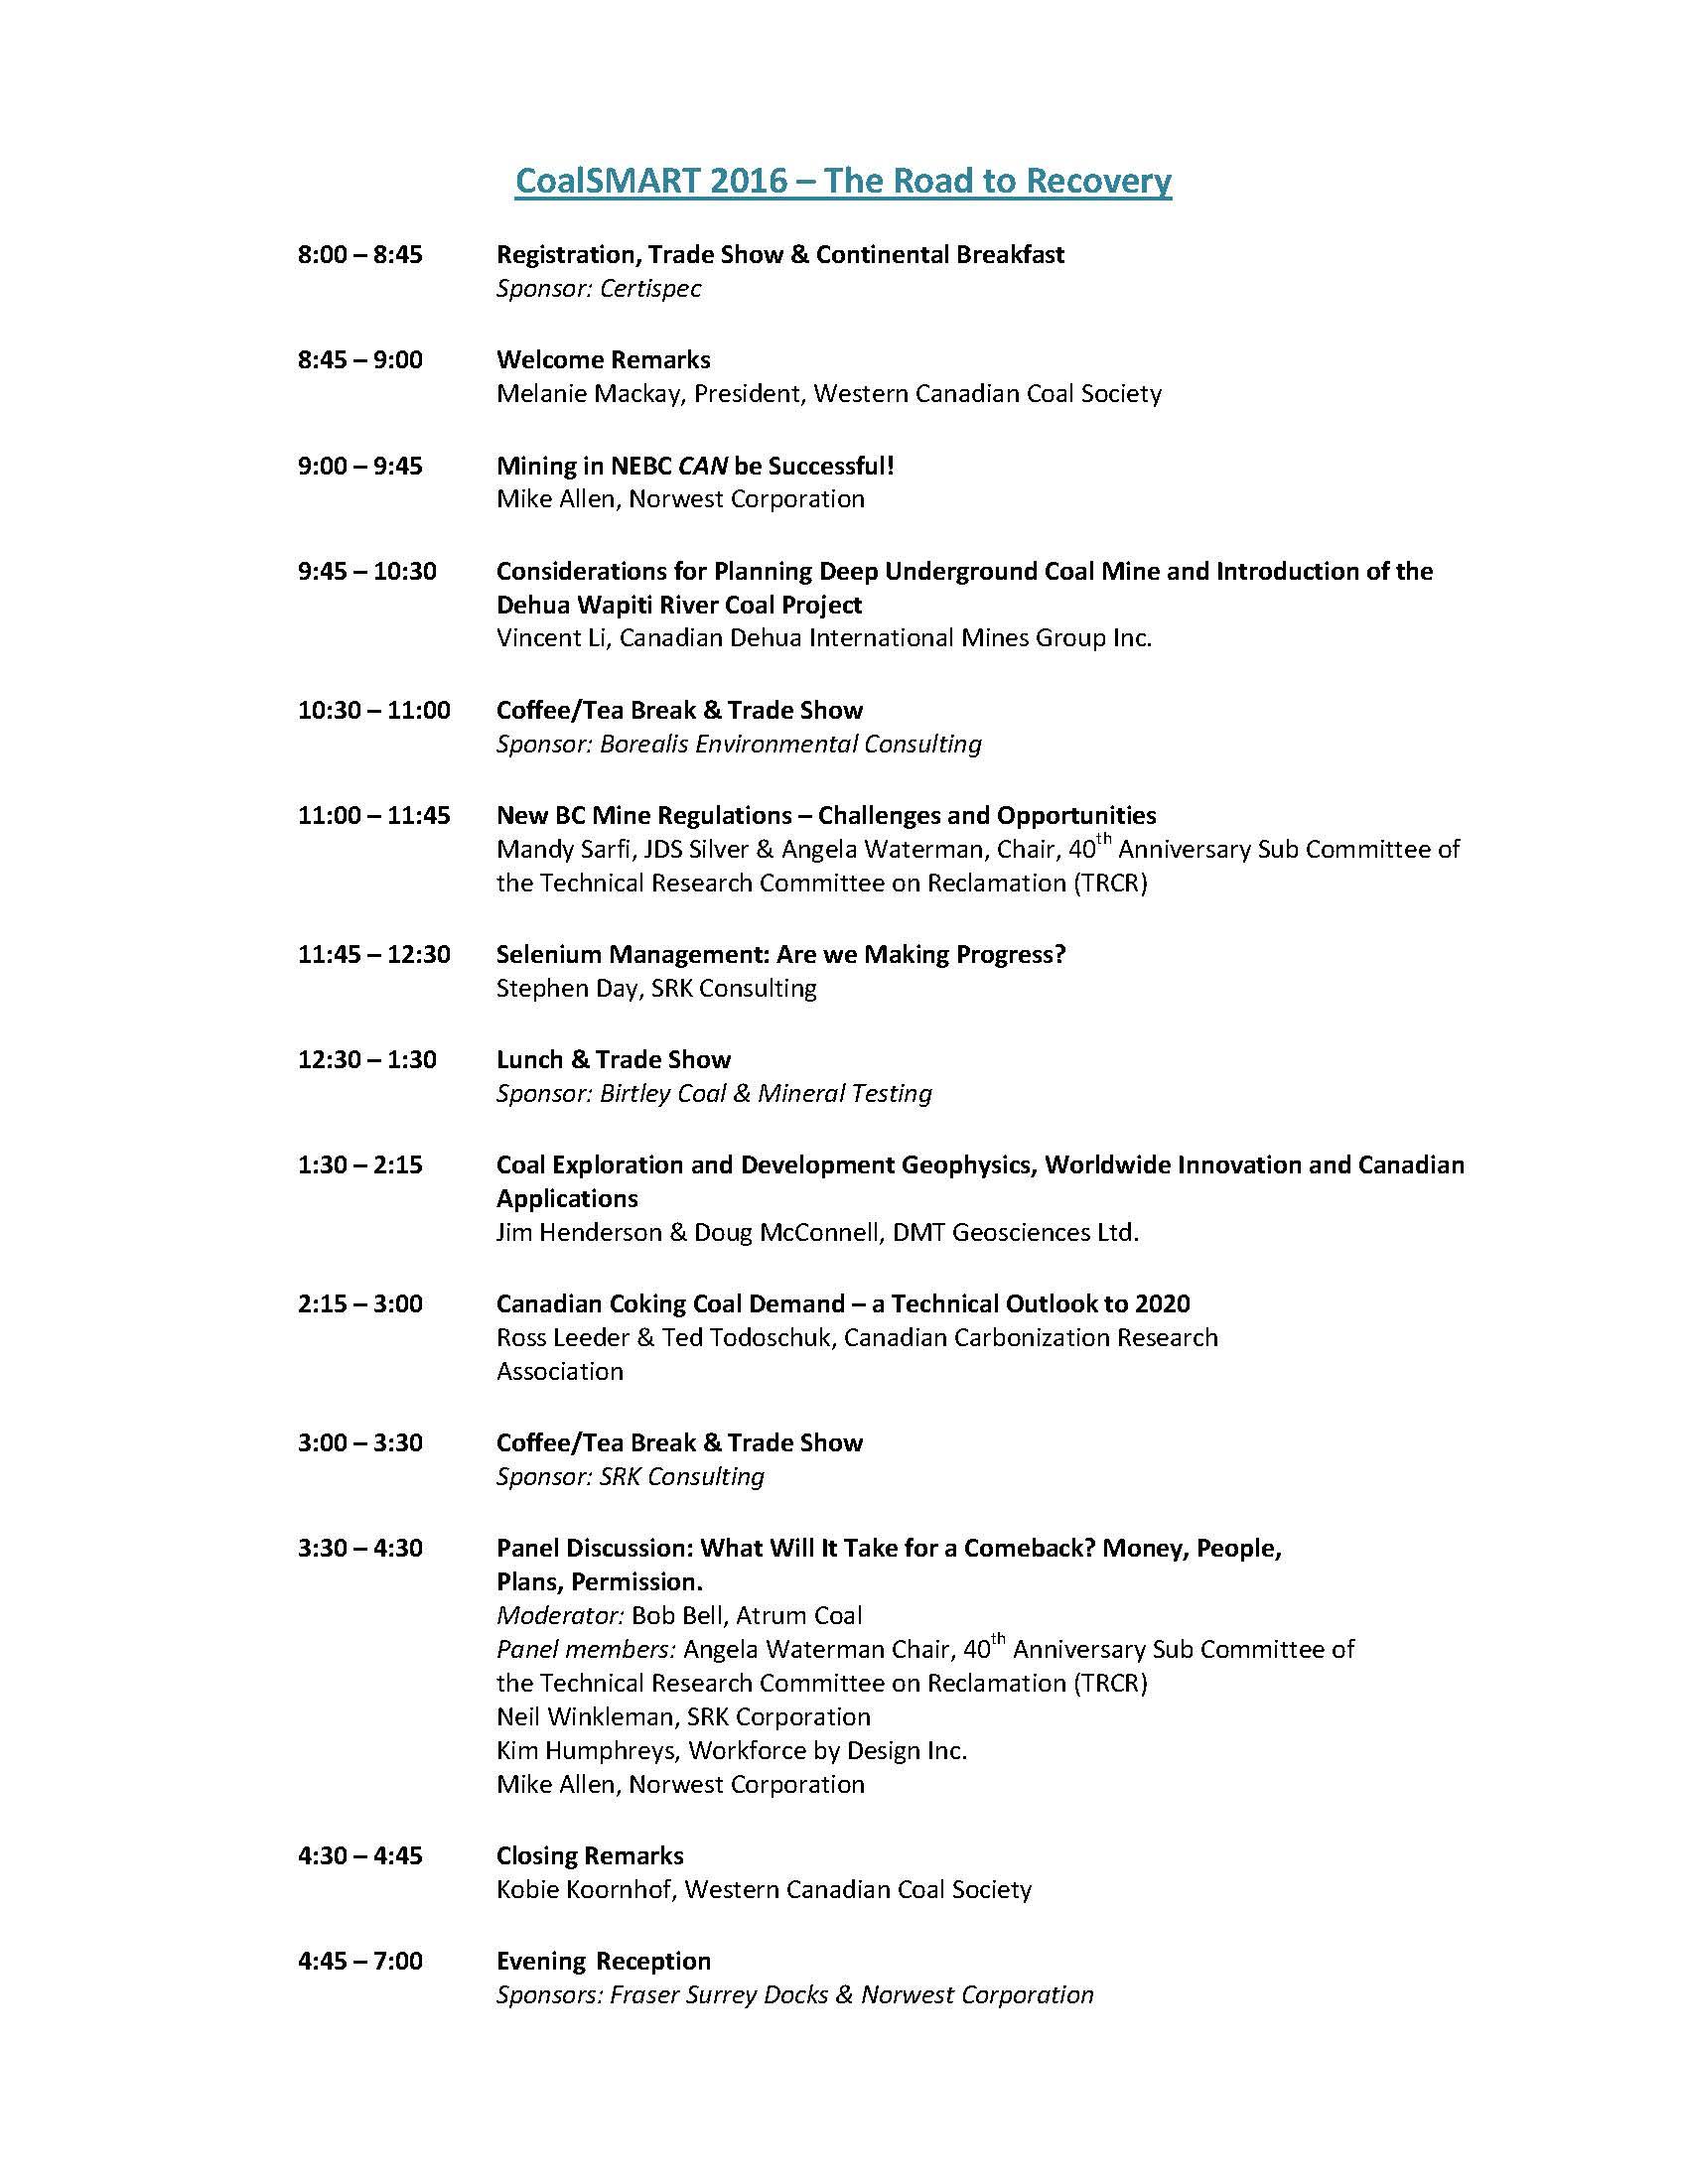 CoalSMART 2016 Agenda